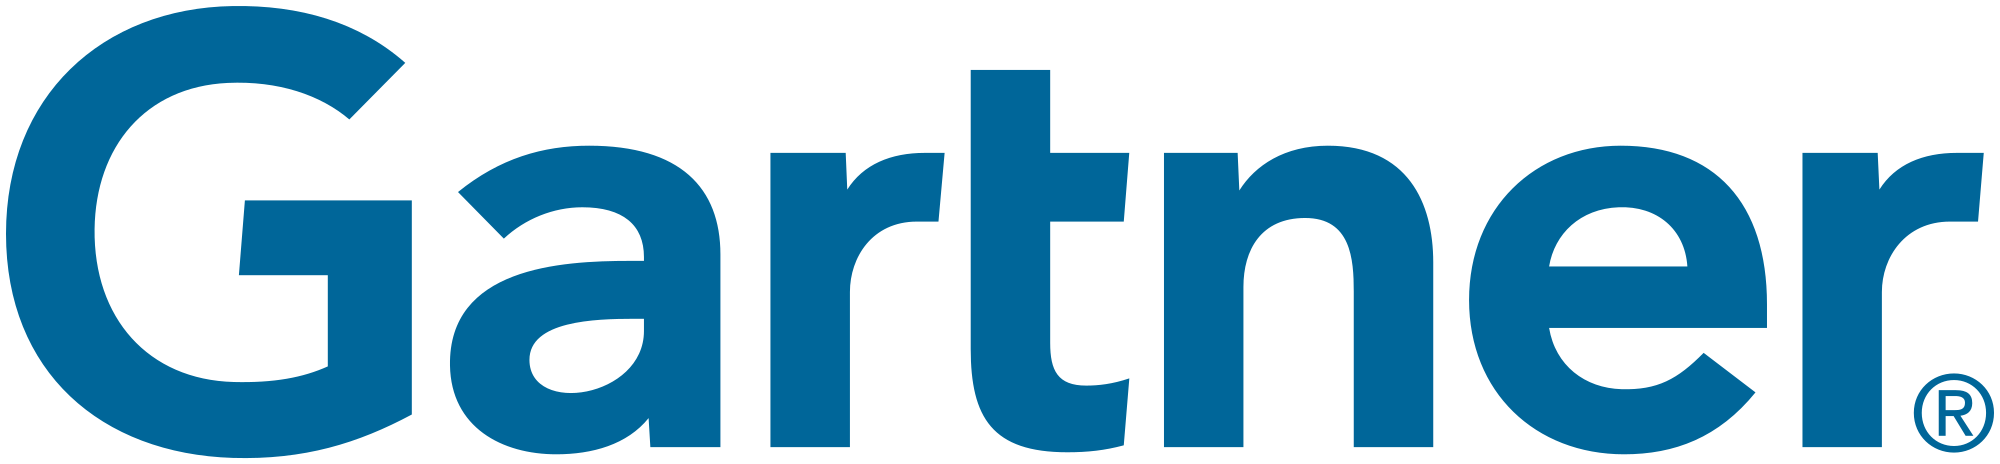 Gartner Logo Logodix